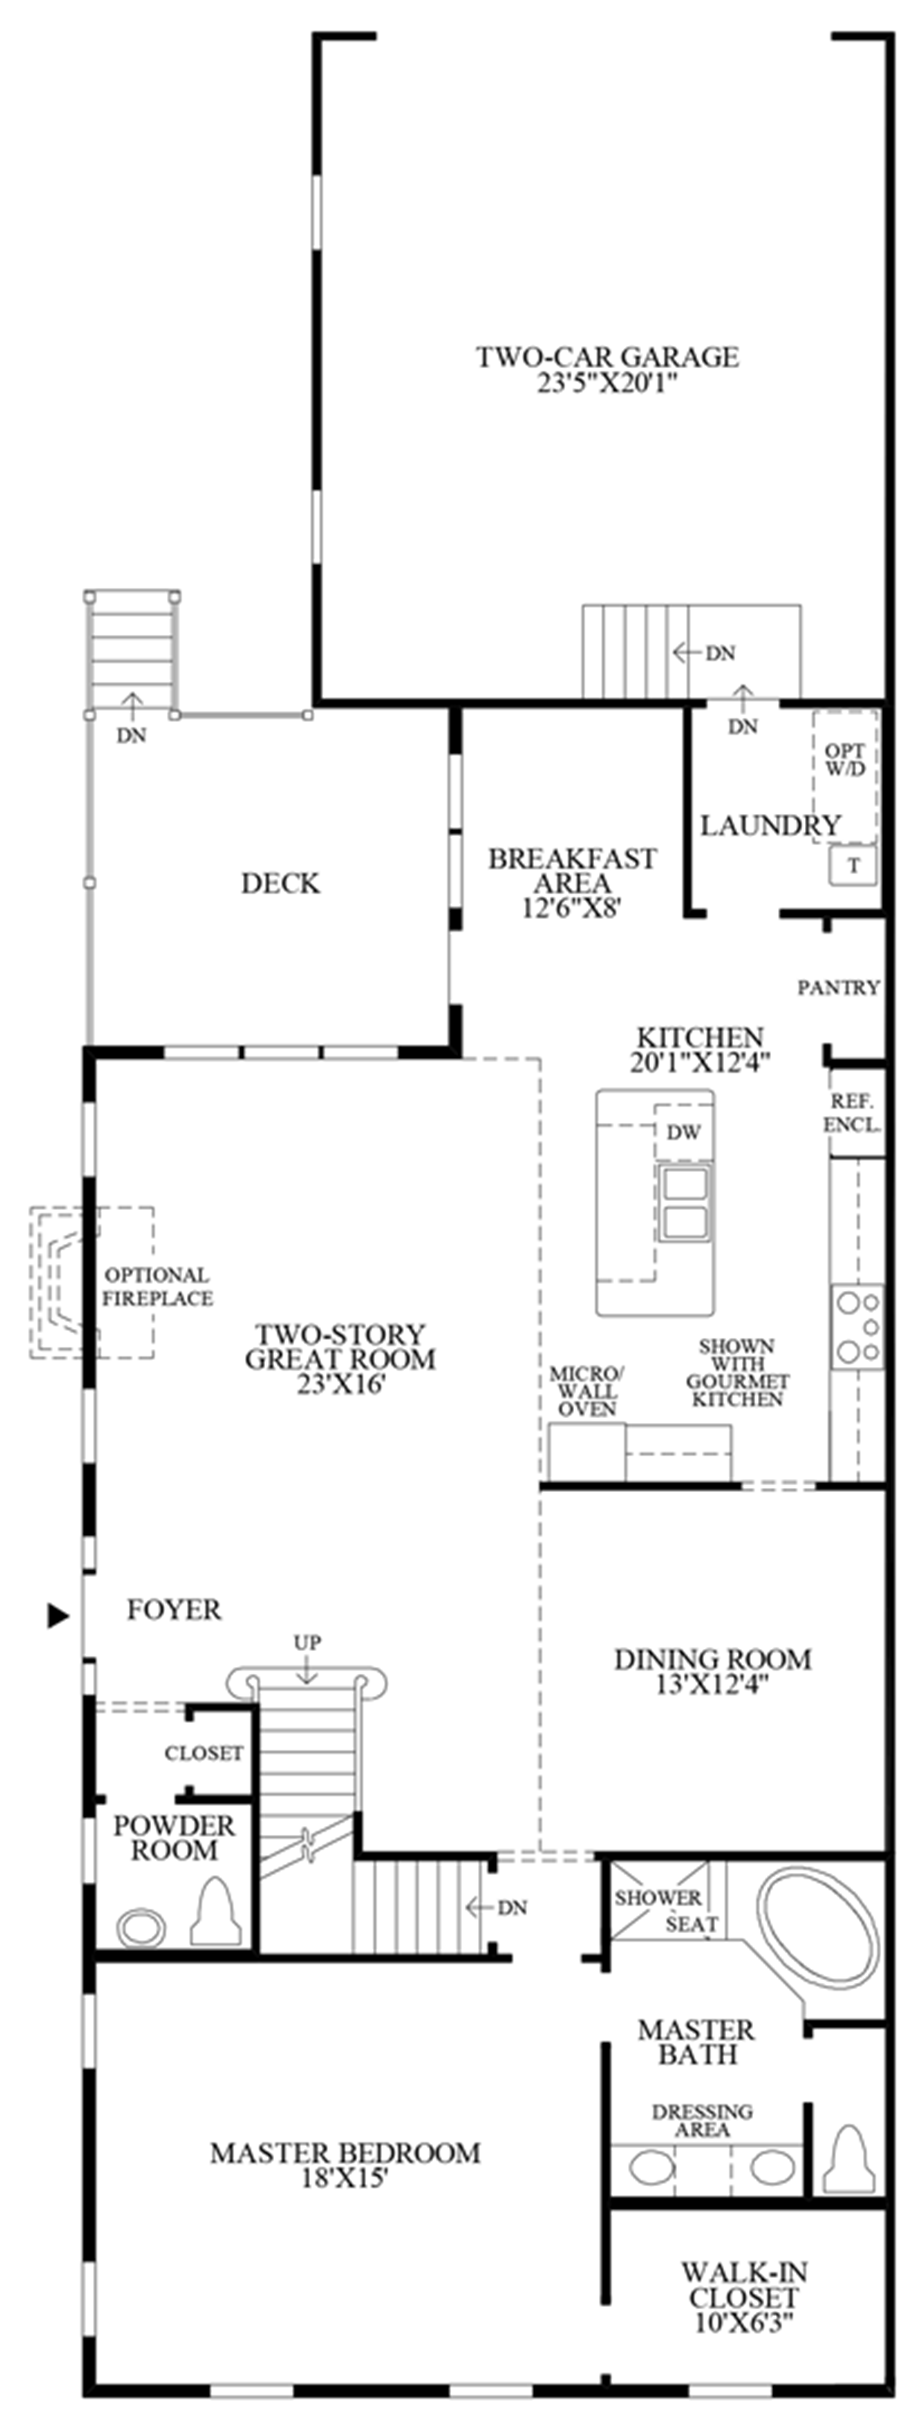 Alternate Master Bath Floor Plan